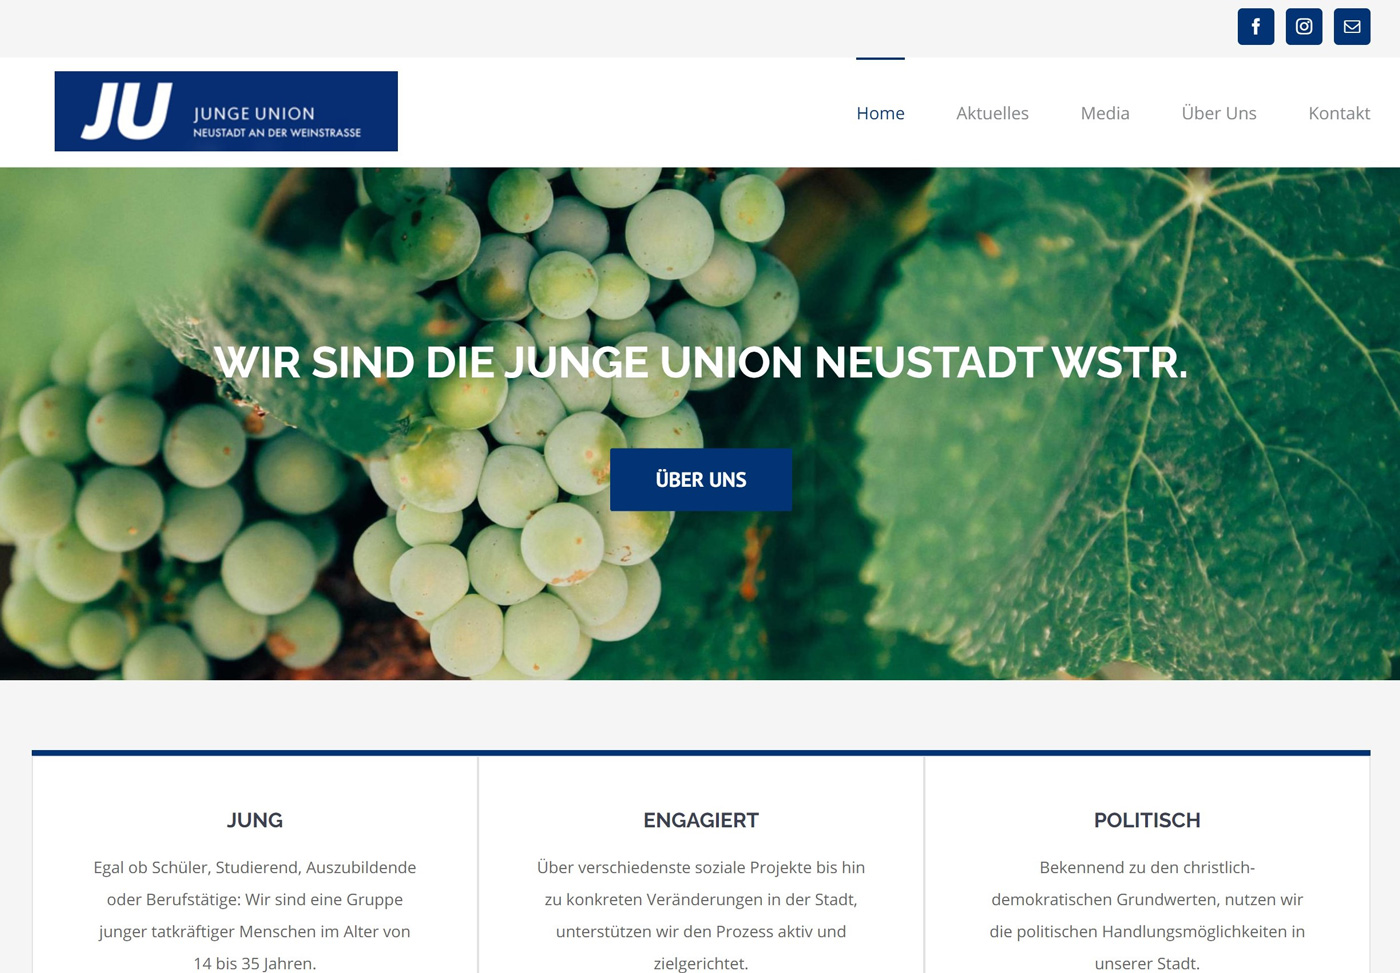 SquaredWebdesign_Referenz_JungeUnion